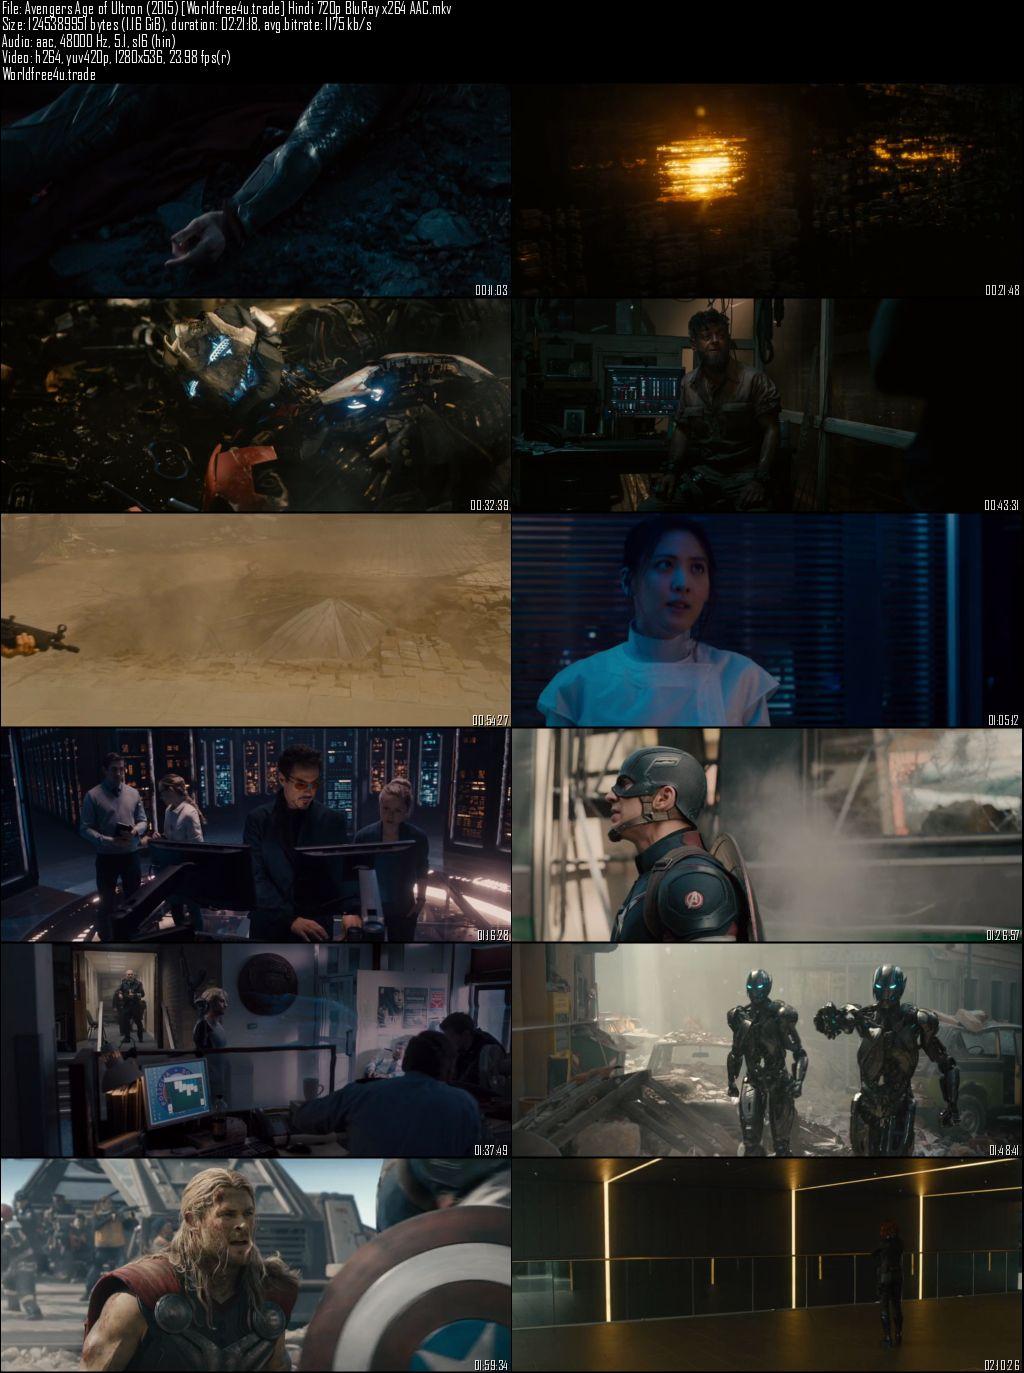 ScreenShot of Avengers: Age of Ultron (2015) BRRip 720p Dual Audio